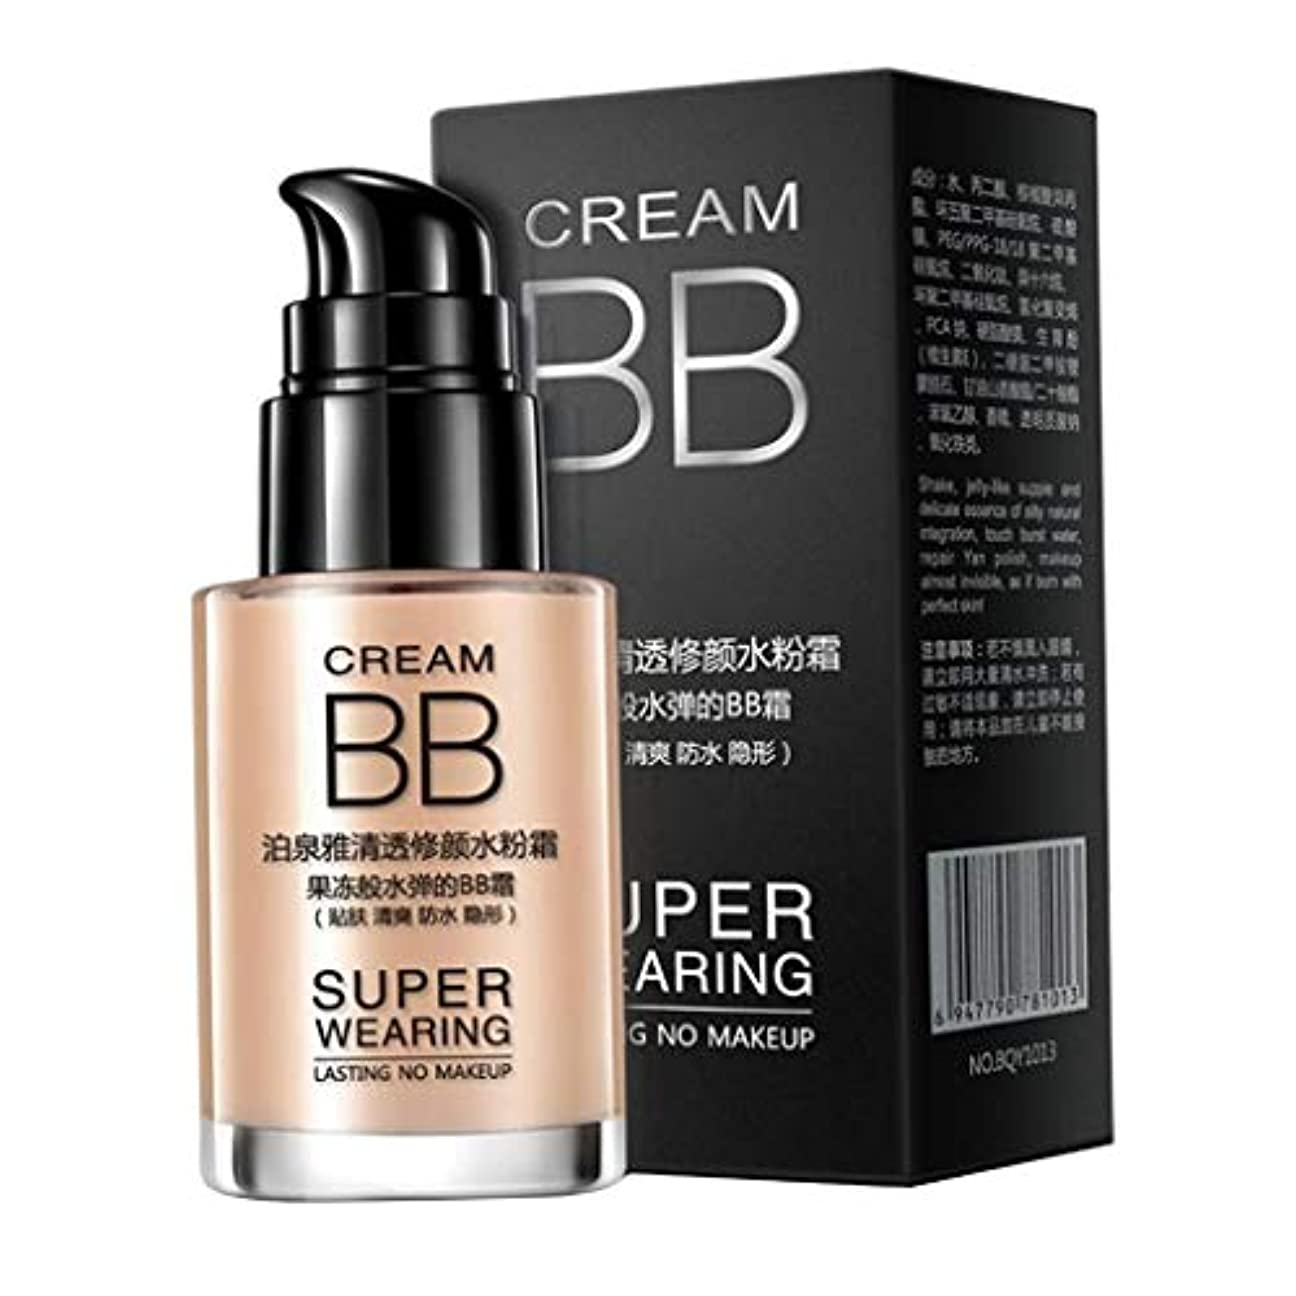 Perfeclan BBクリーム クリーム 顔 フェイスメイク 裸化粧 30ml 防水性 防汗性 全3カラー - アイボリーホワイト